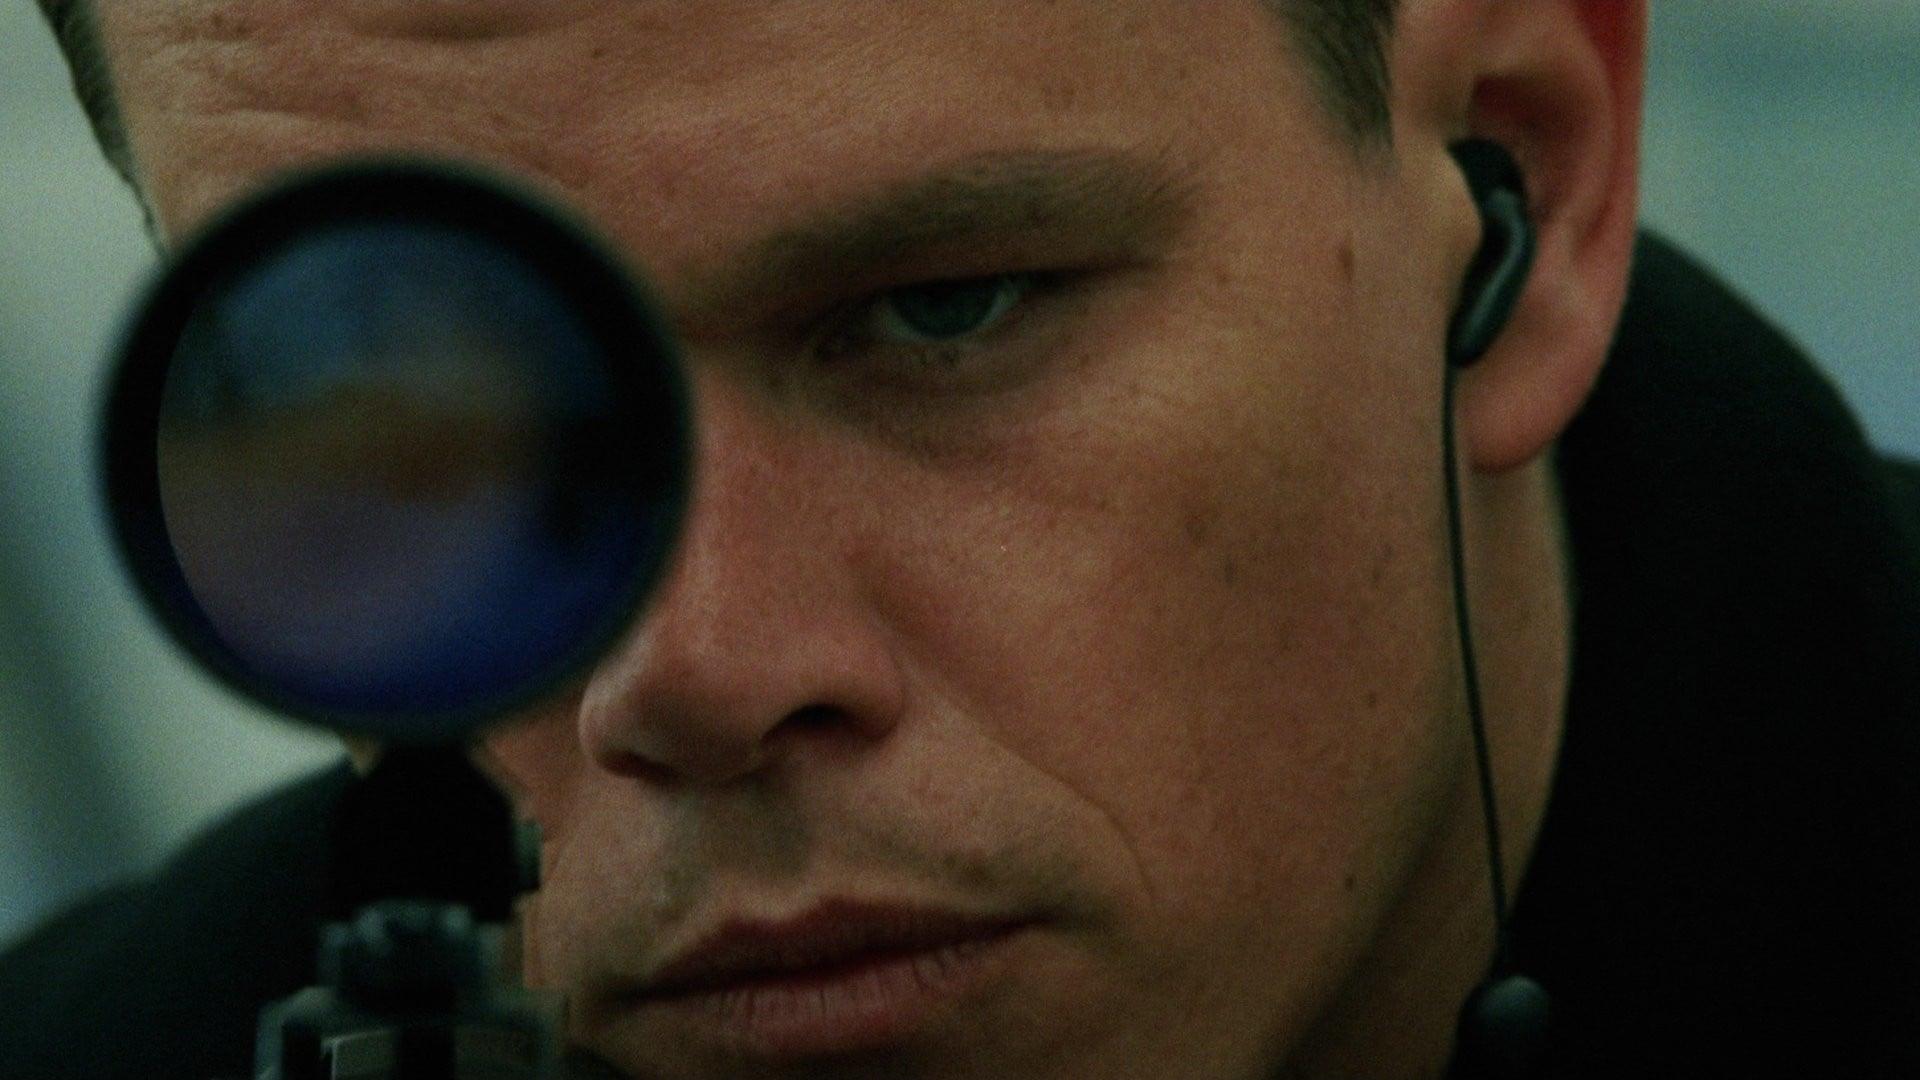 The Bourne Supremacy